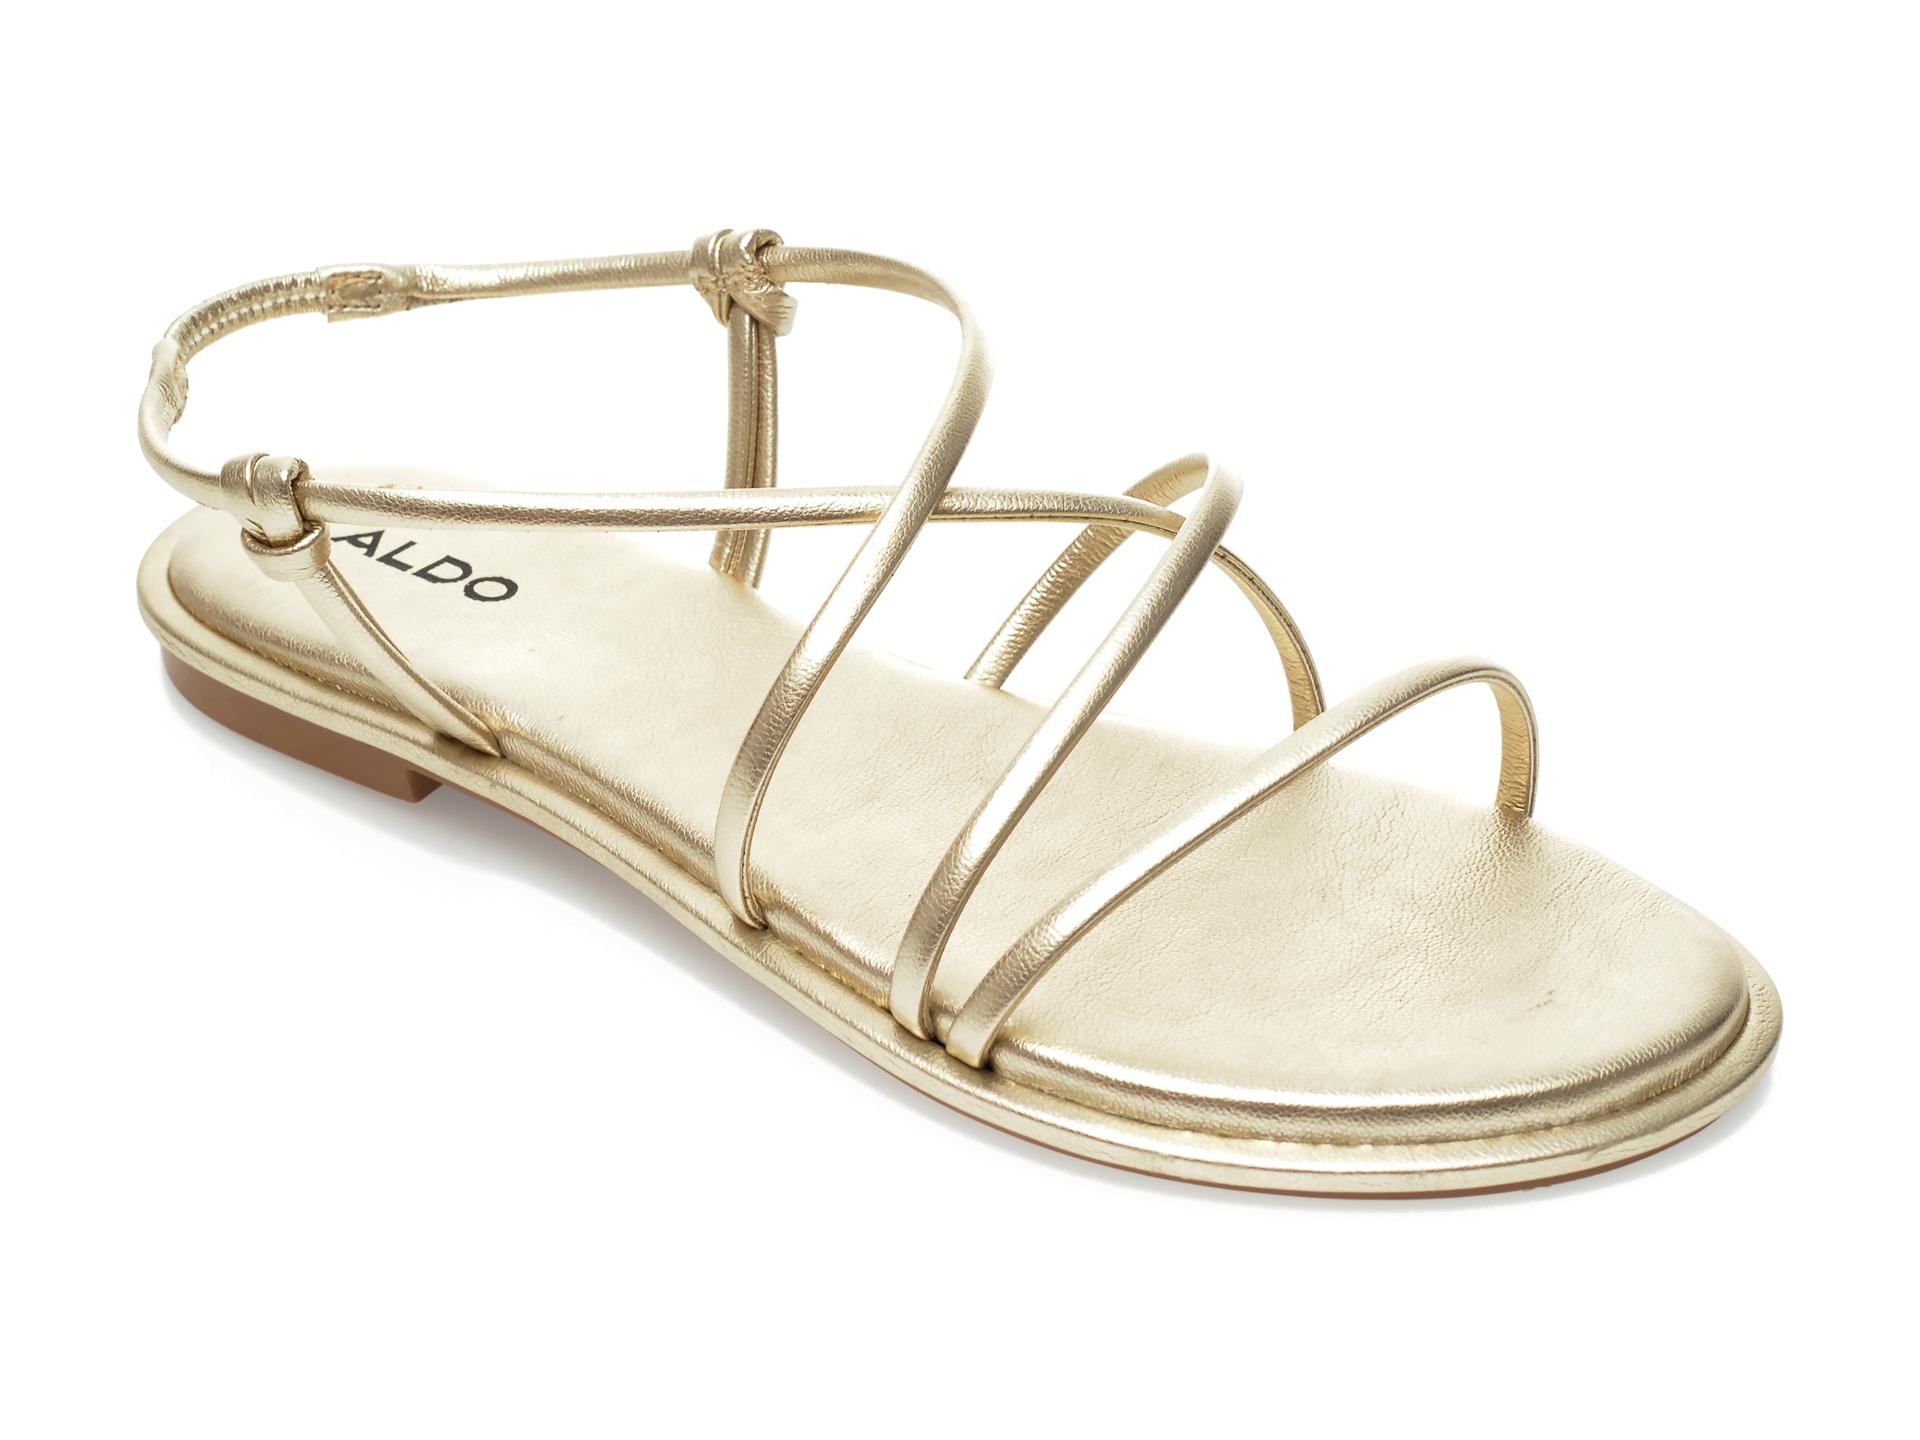 Papuci ALDO aurii, Kuerten710, din piele ecologica imagine otter.ro 2021